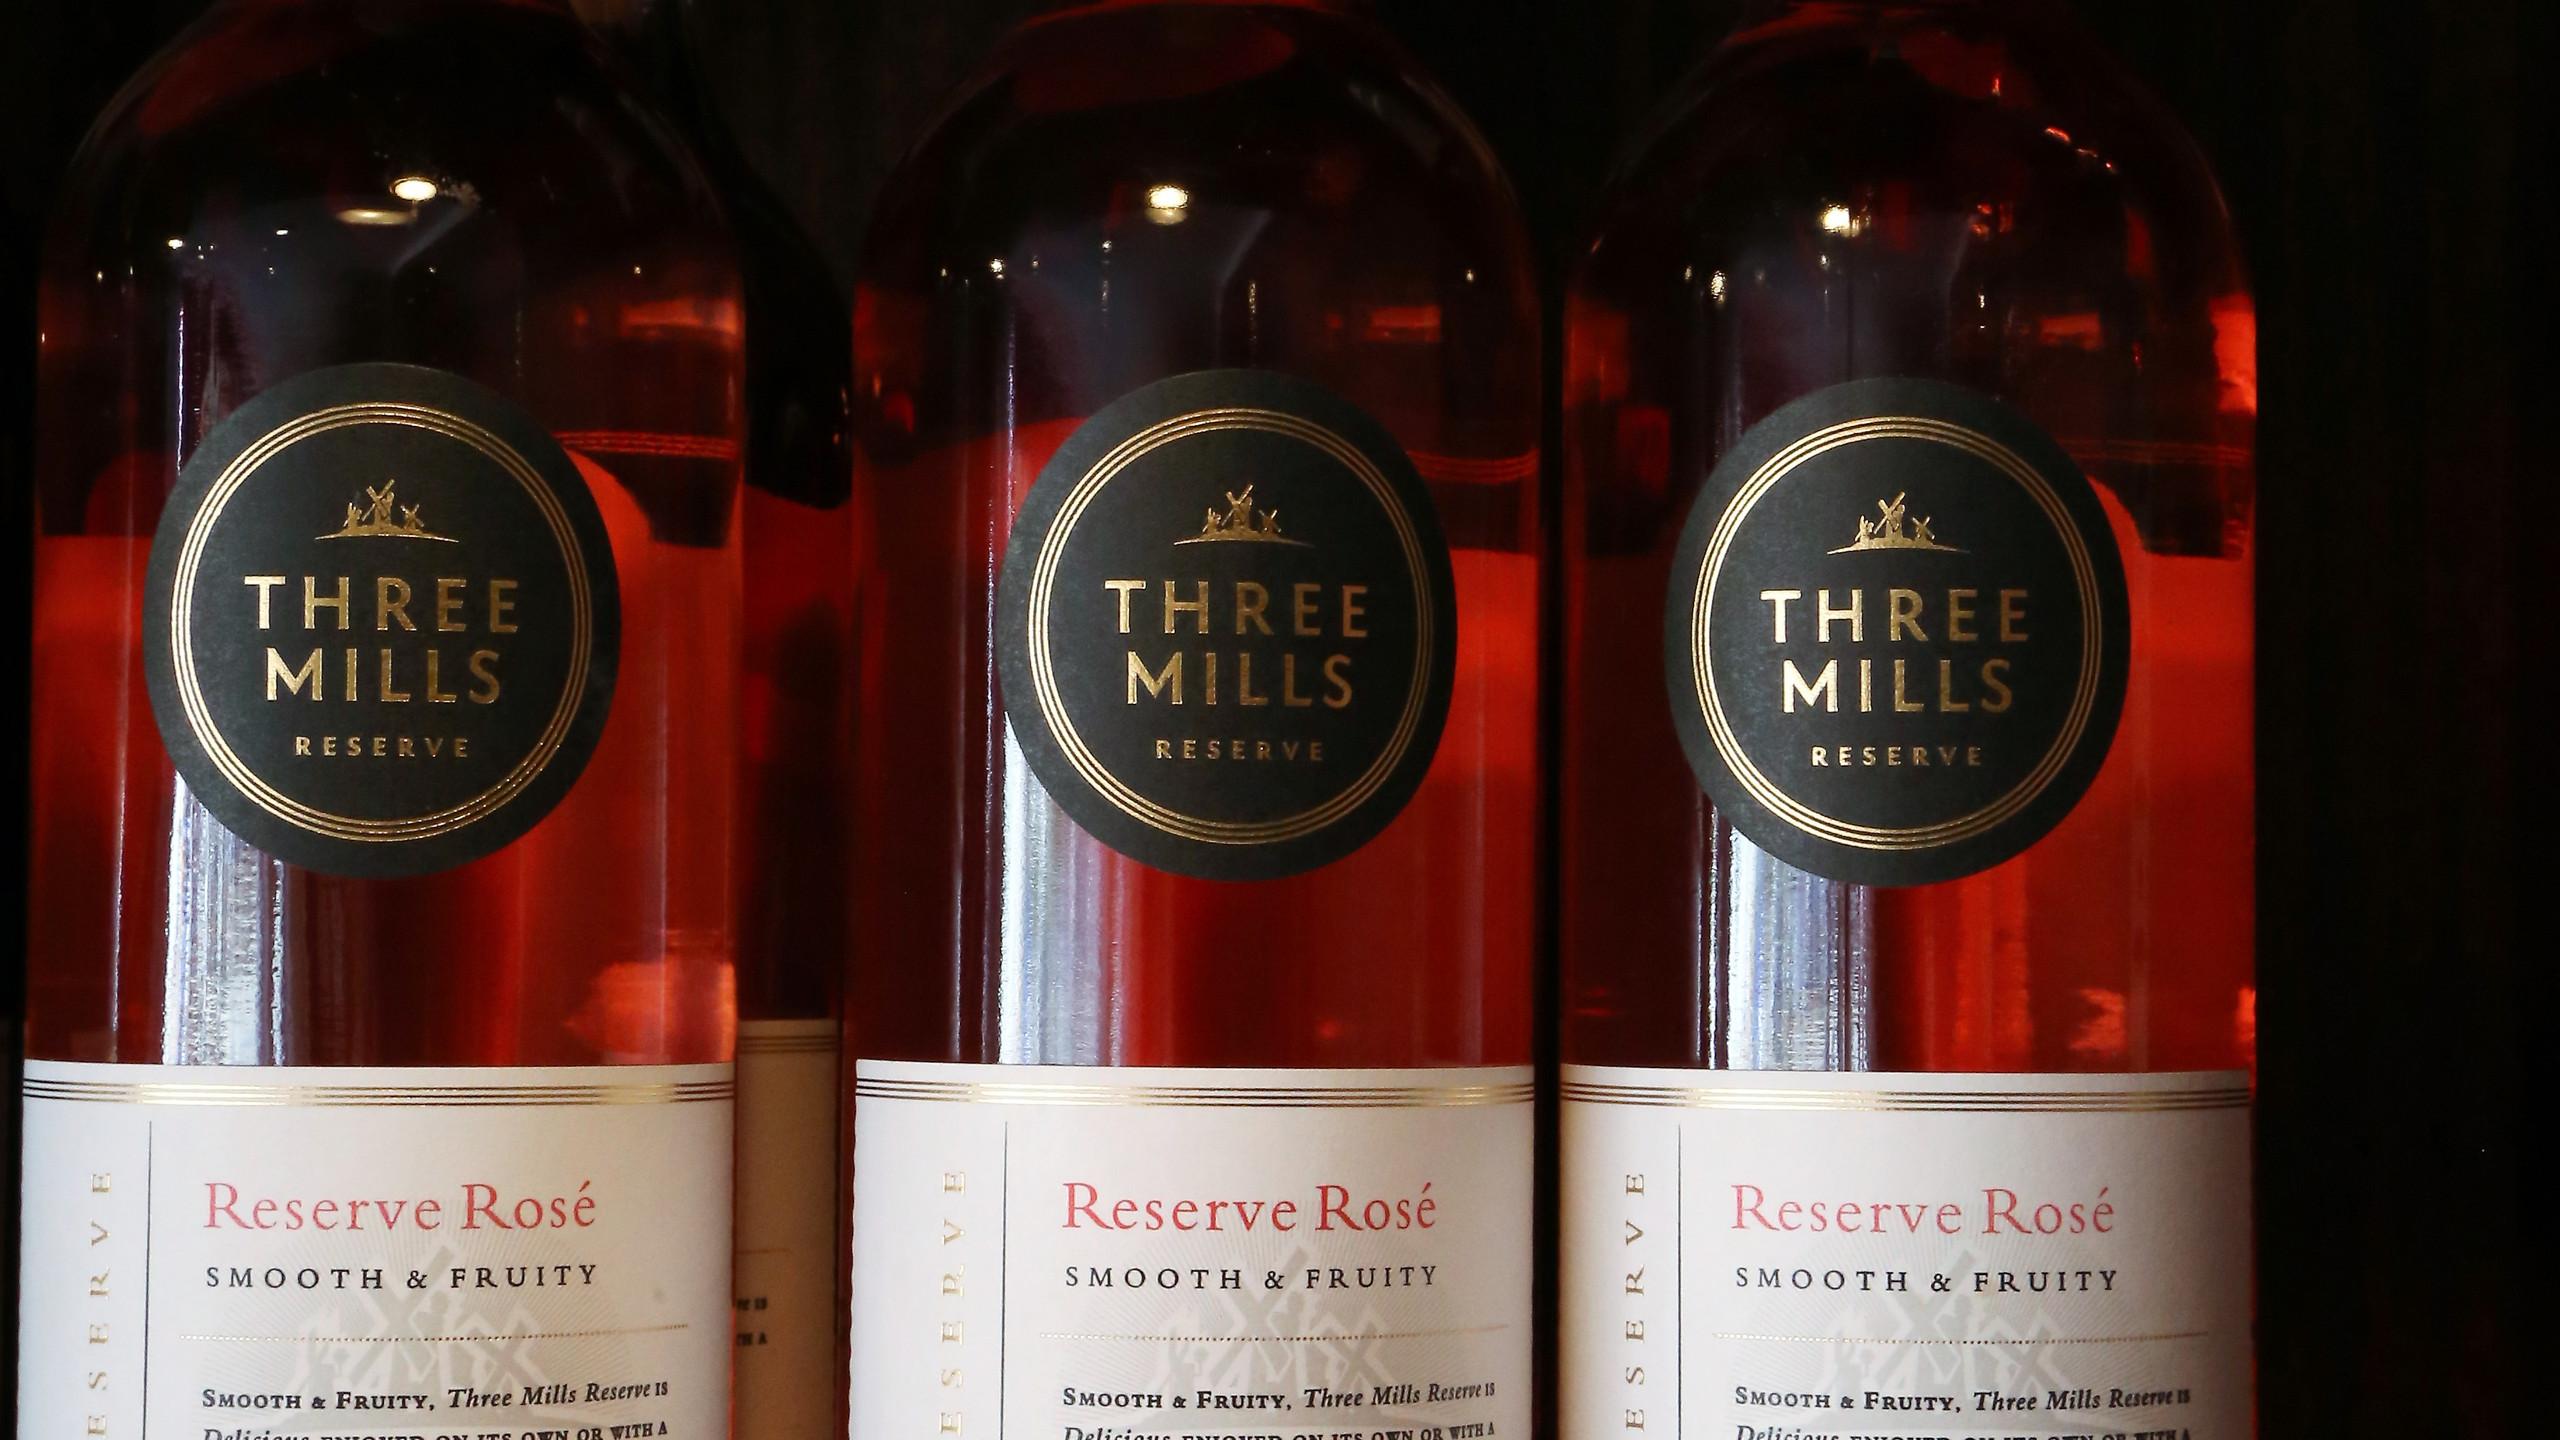 Three MIlls reserve Rose